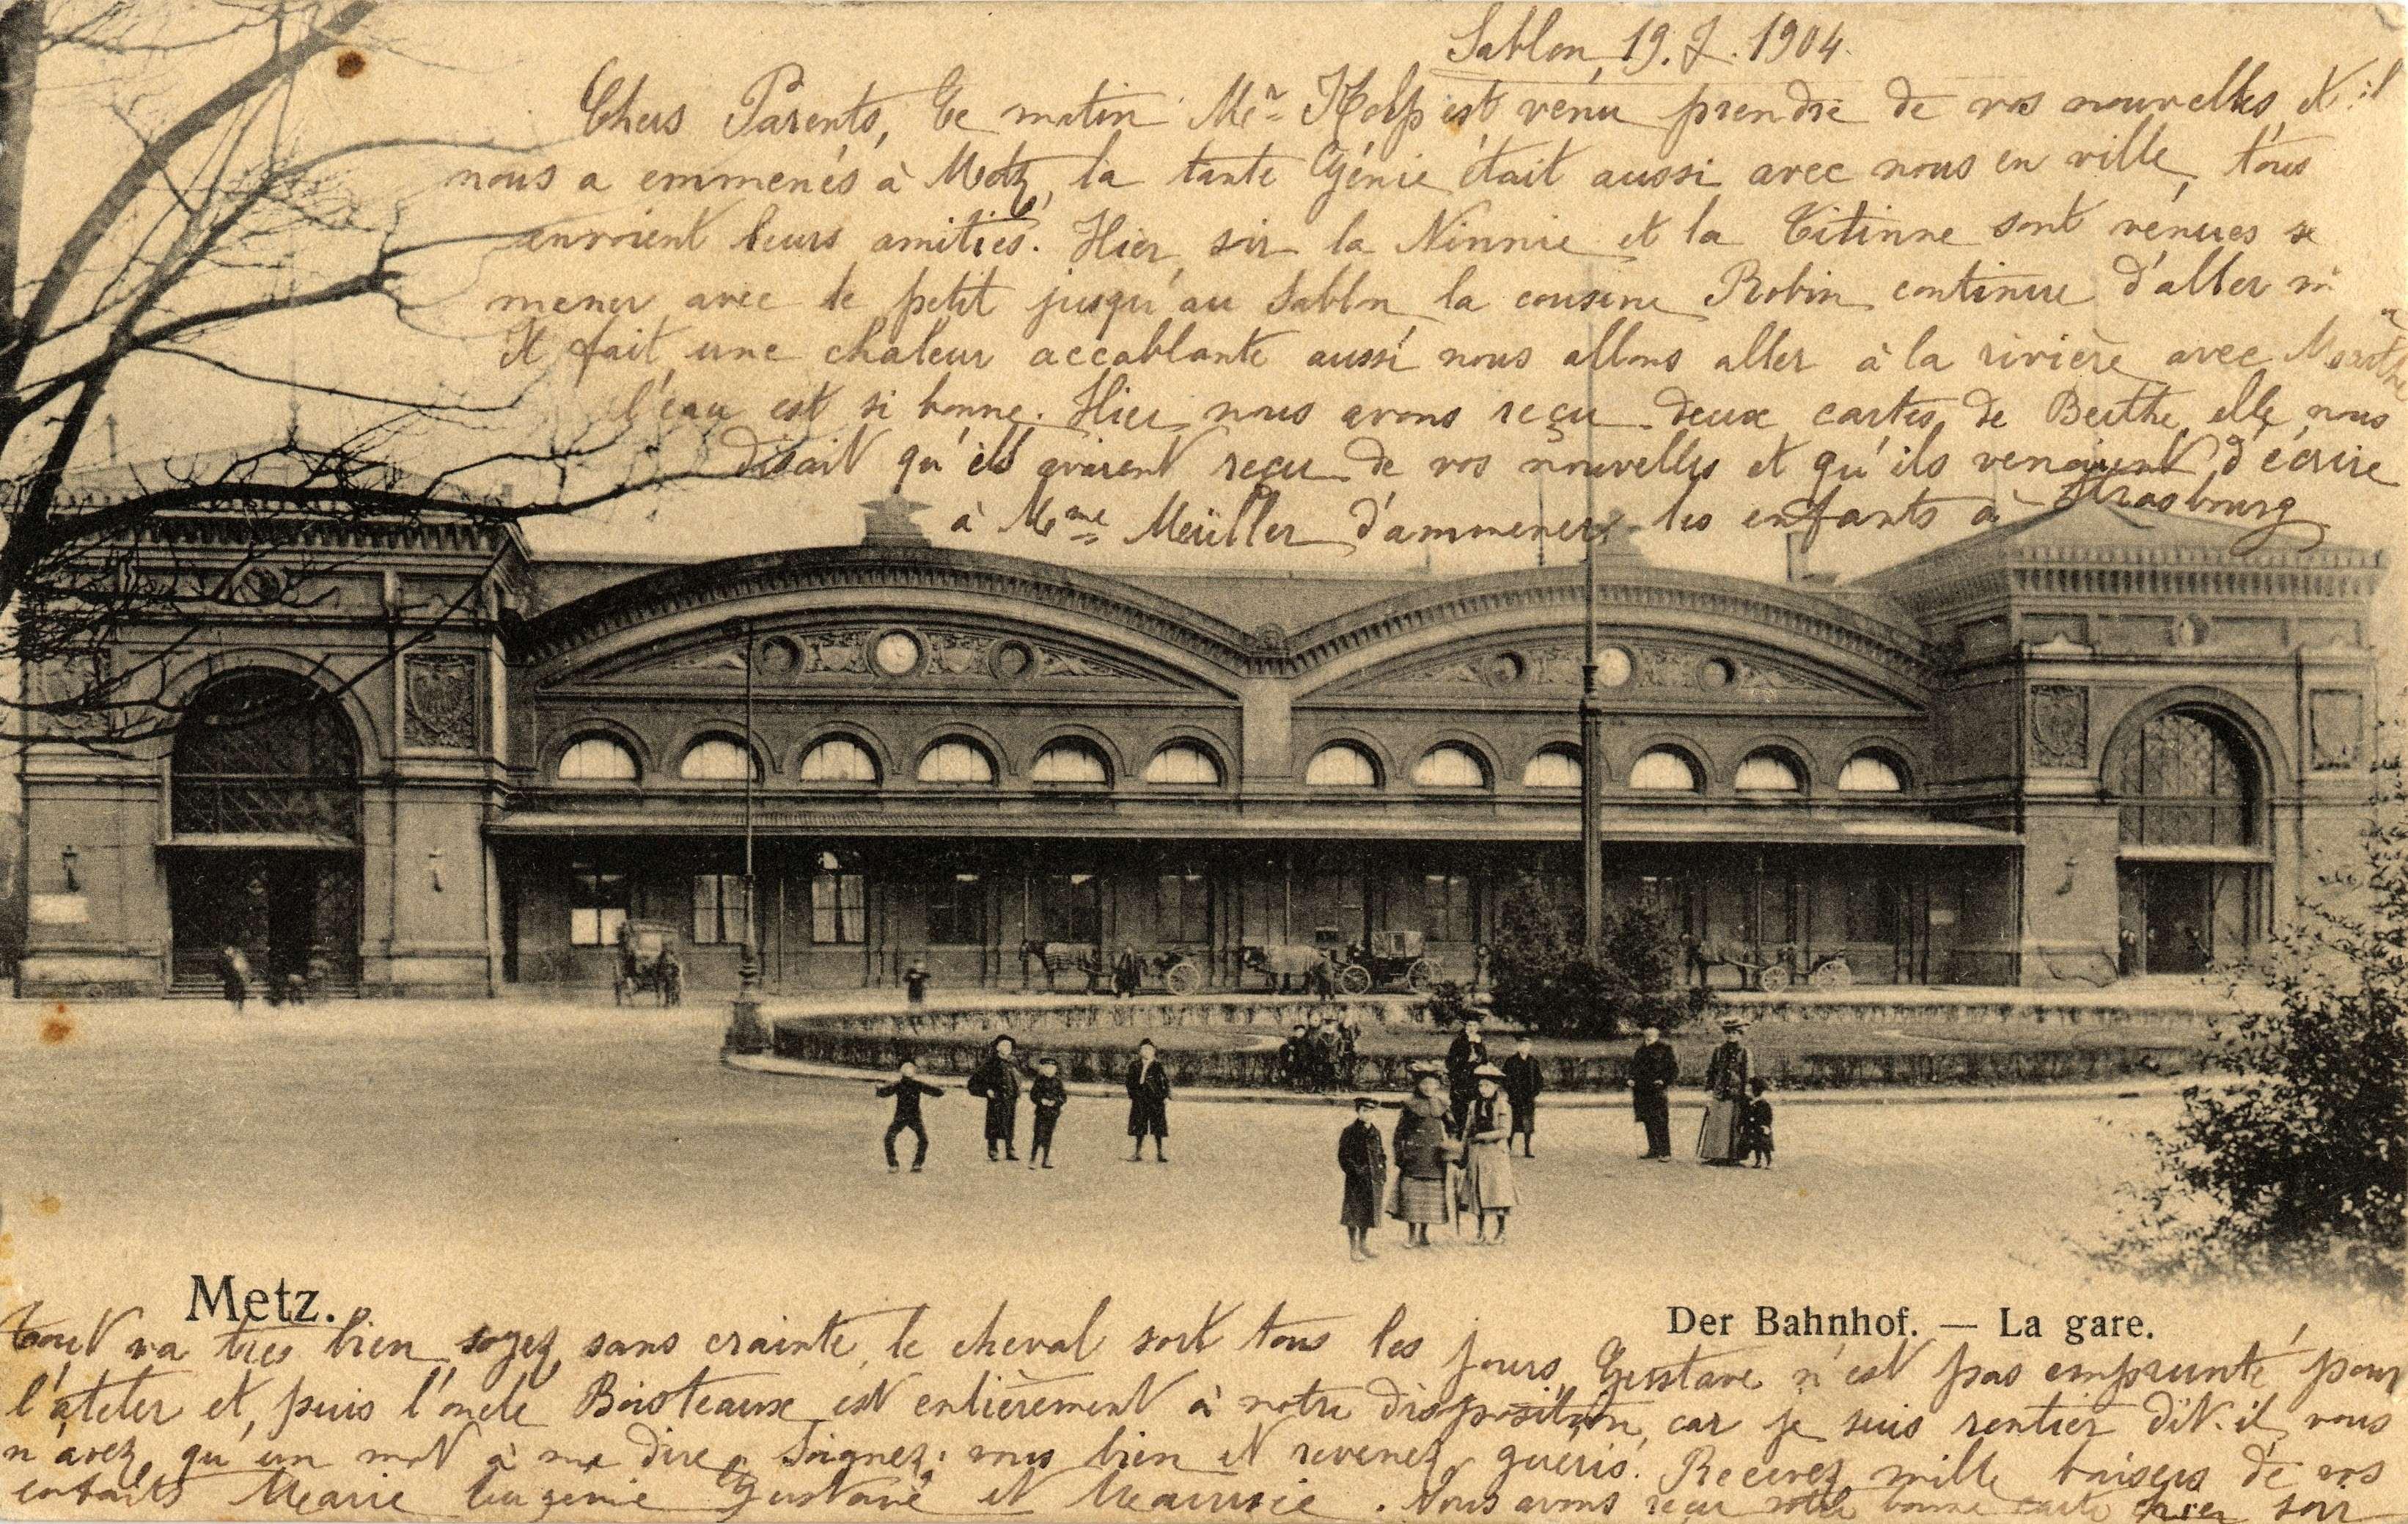 Contenu du Metz. Der Bahnhof. La Gare